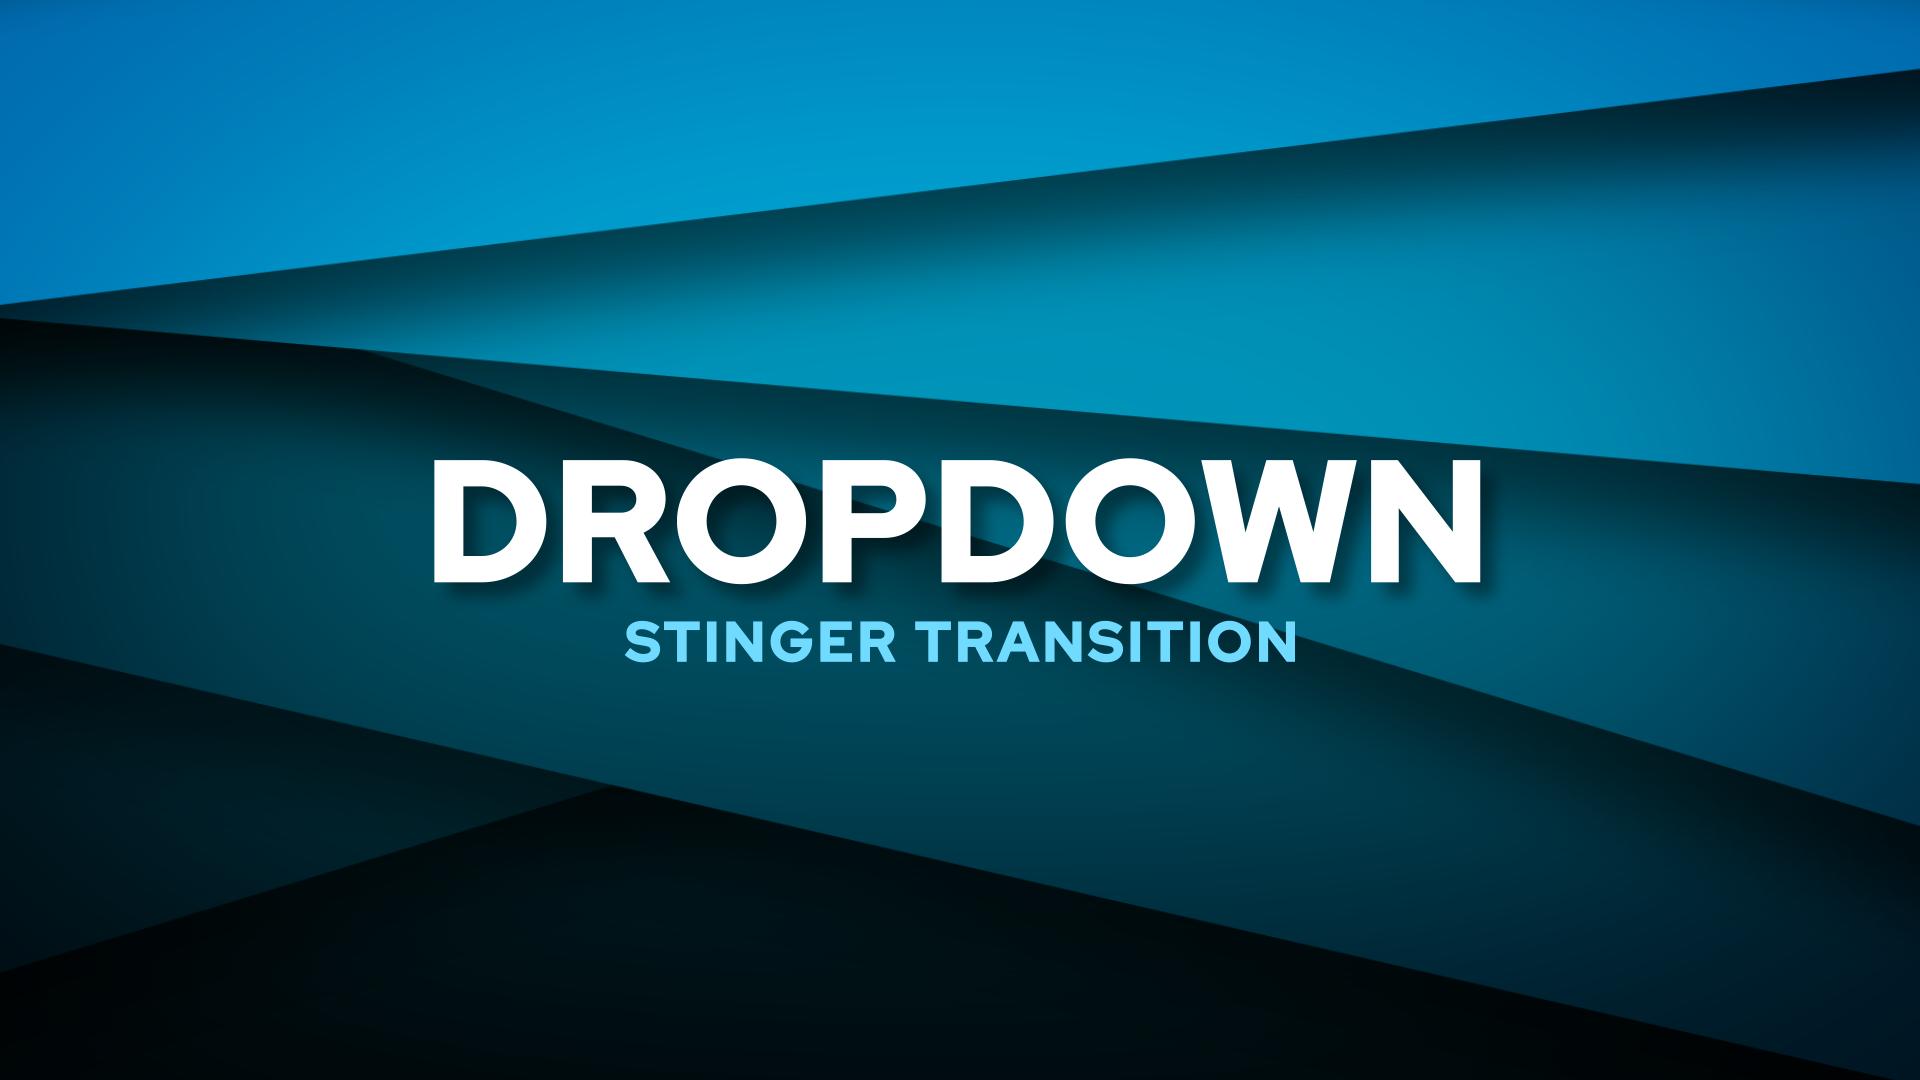 Dropdown Stinger Transition